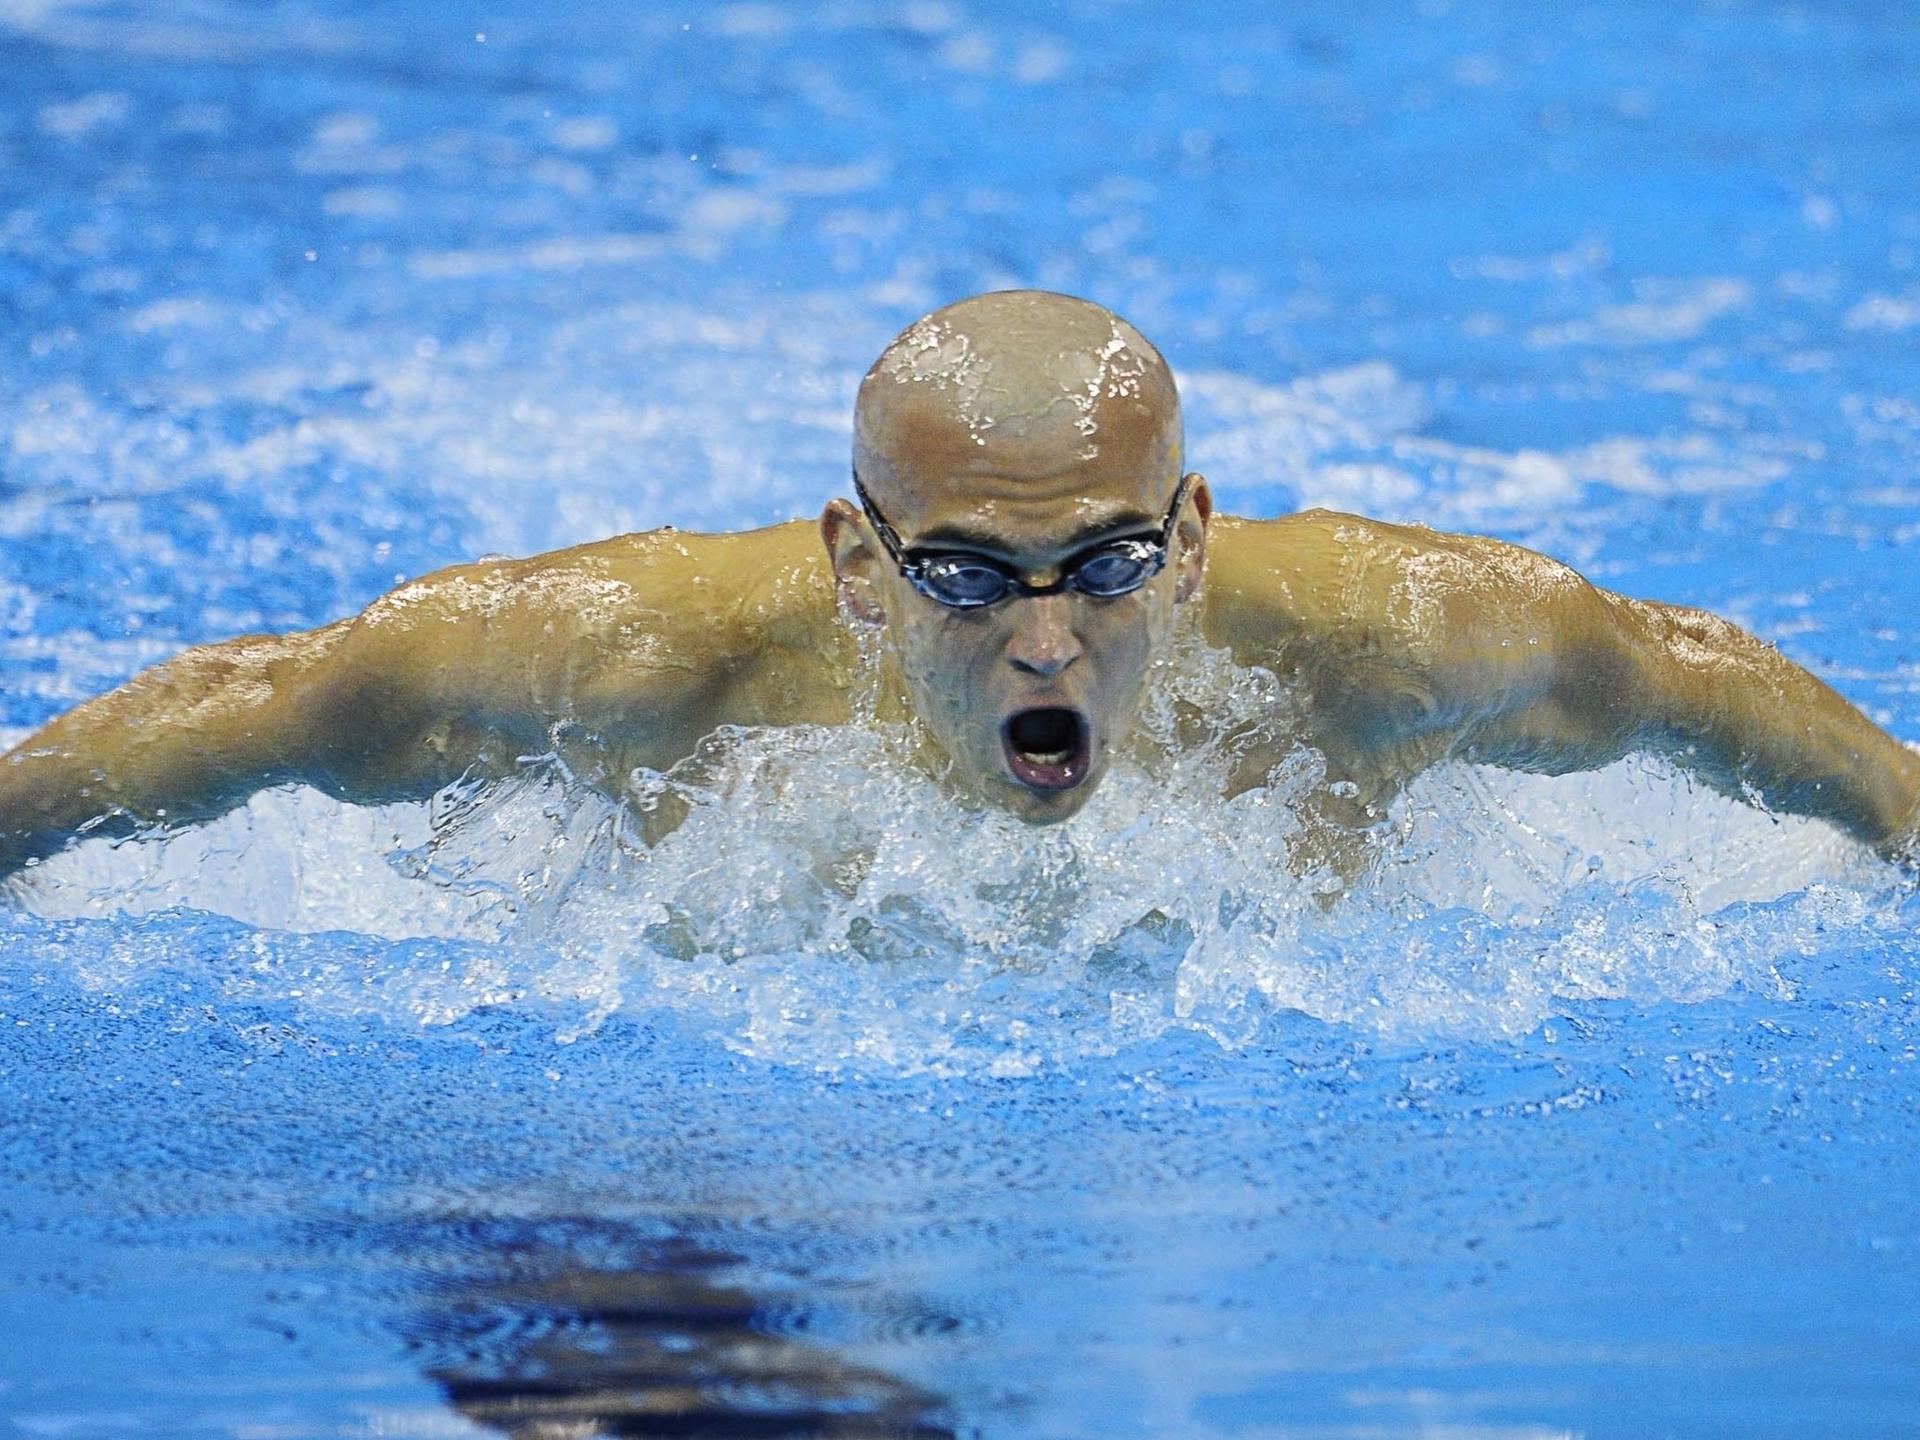 Swimming olympics swimming pools athletes hungarian olympics (1920x1440)